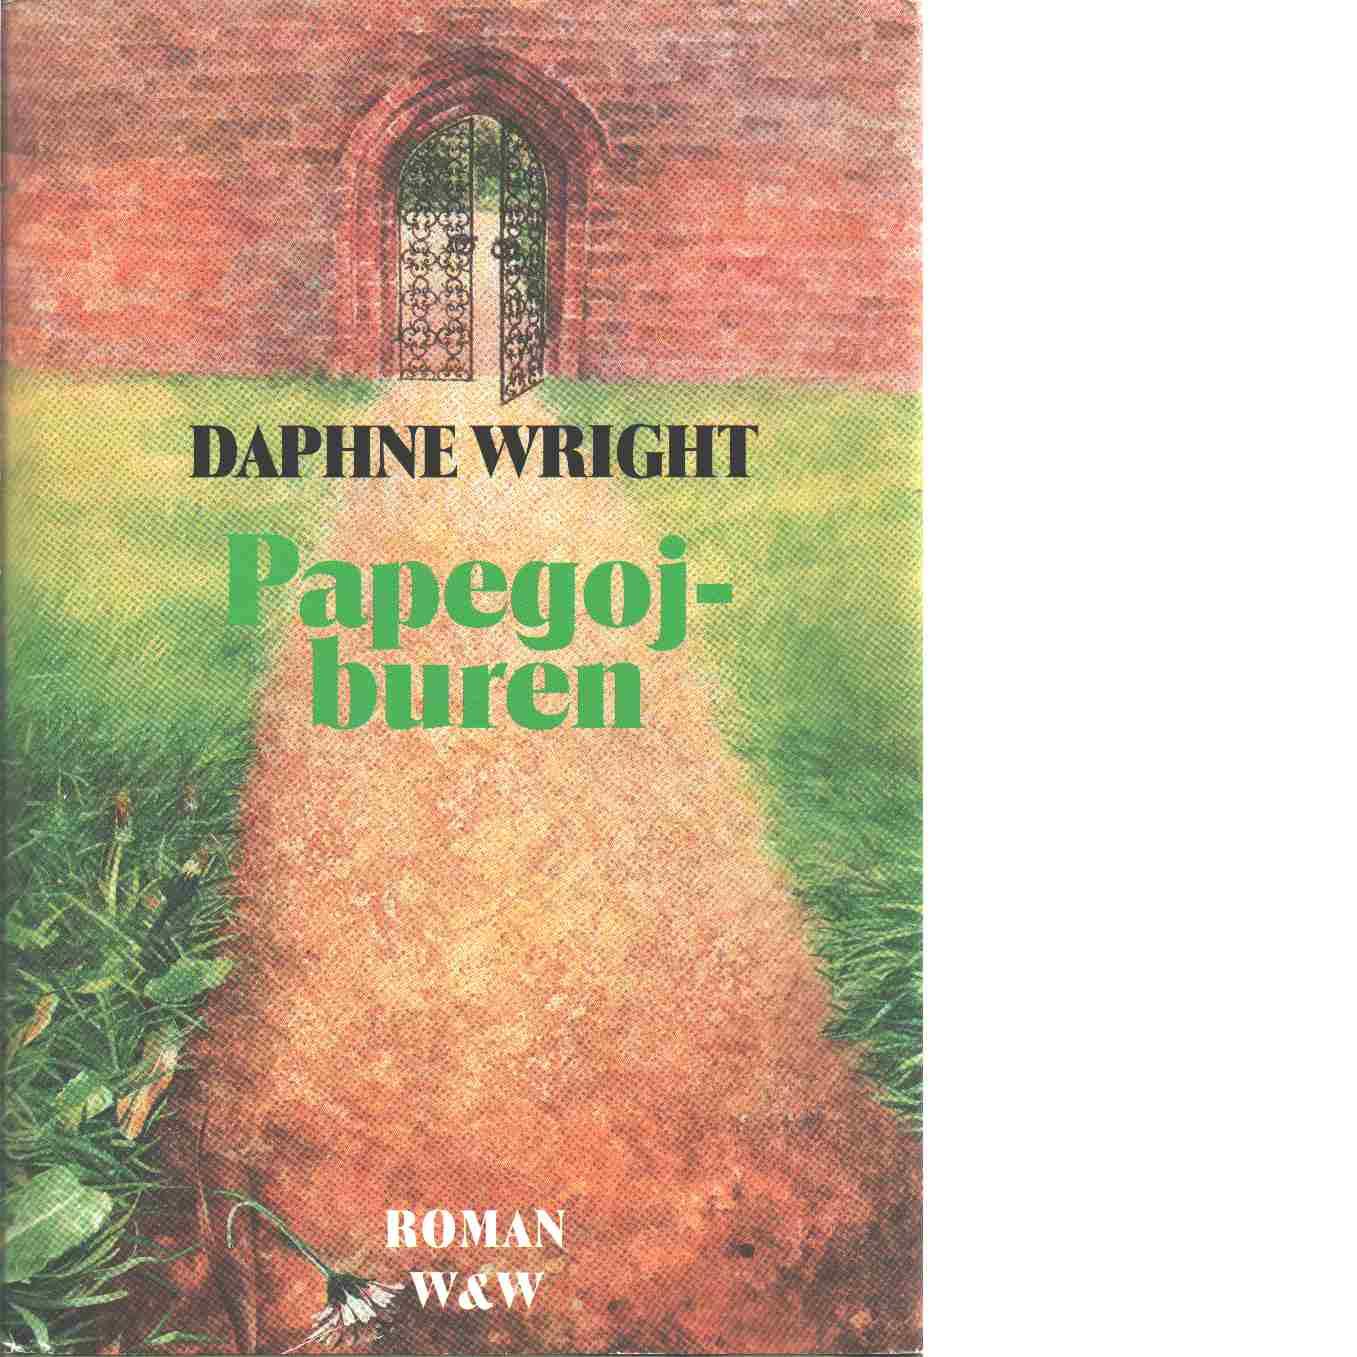 Papegojburen - Wright, Daphne